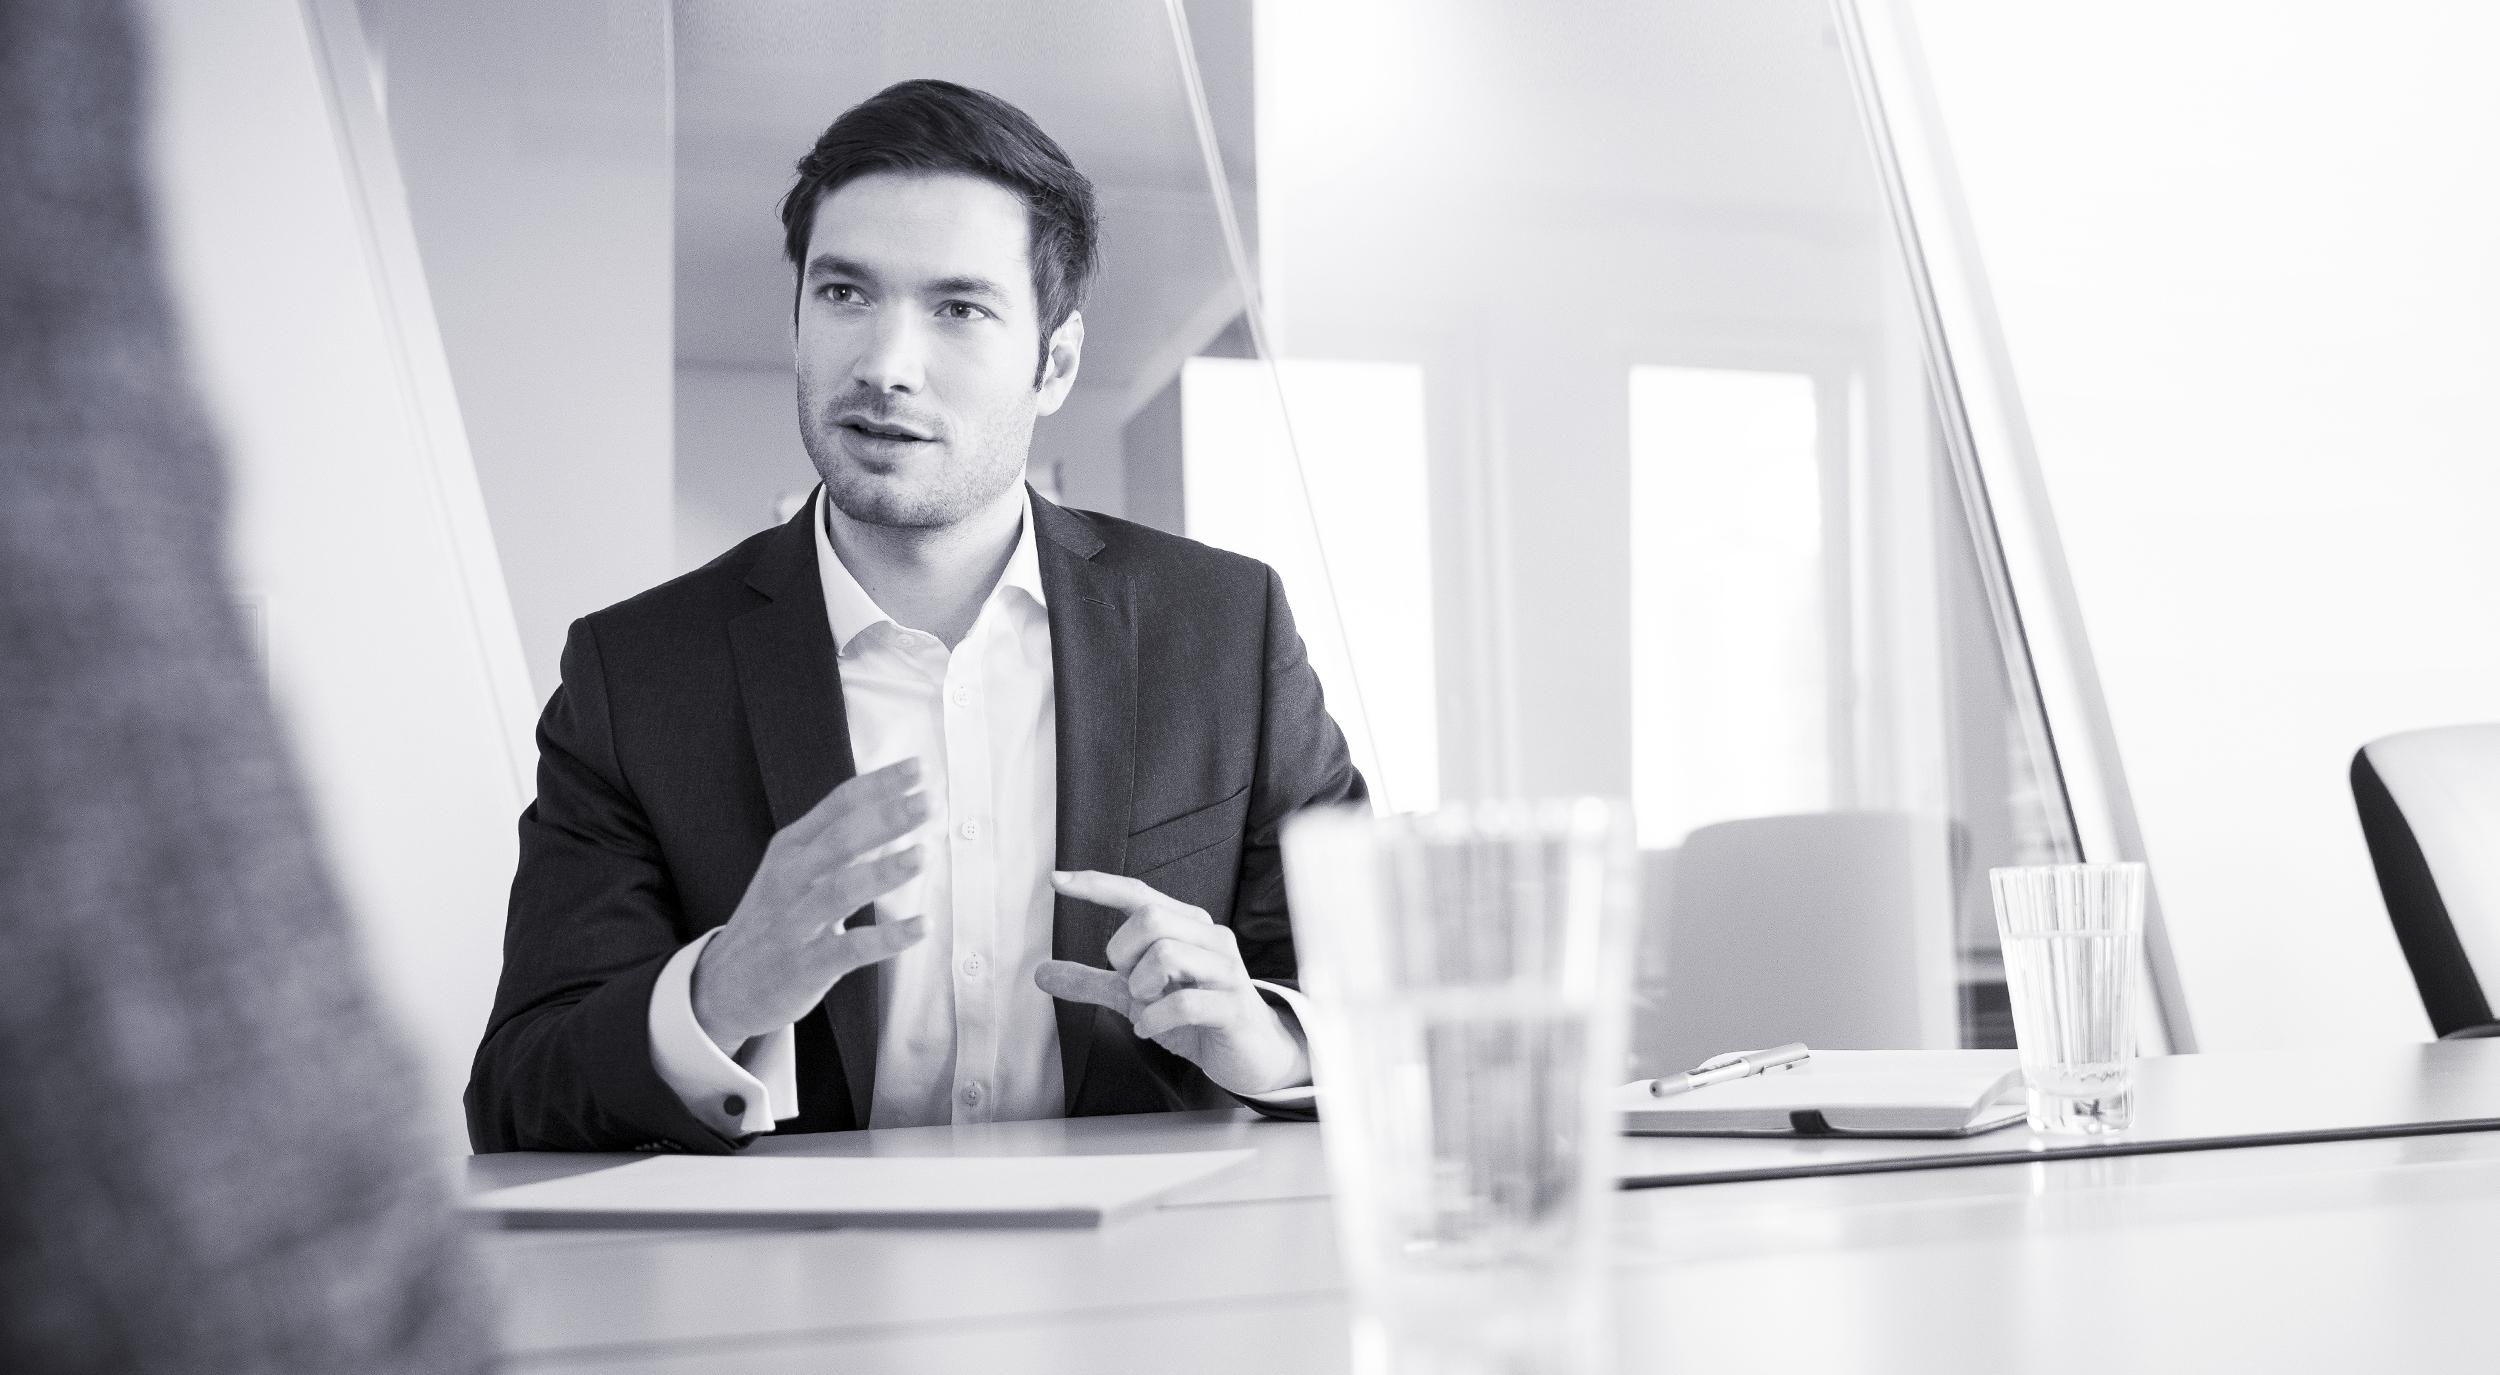 Berater im Kundengespräch